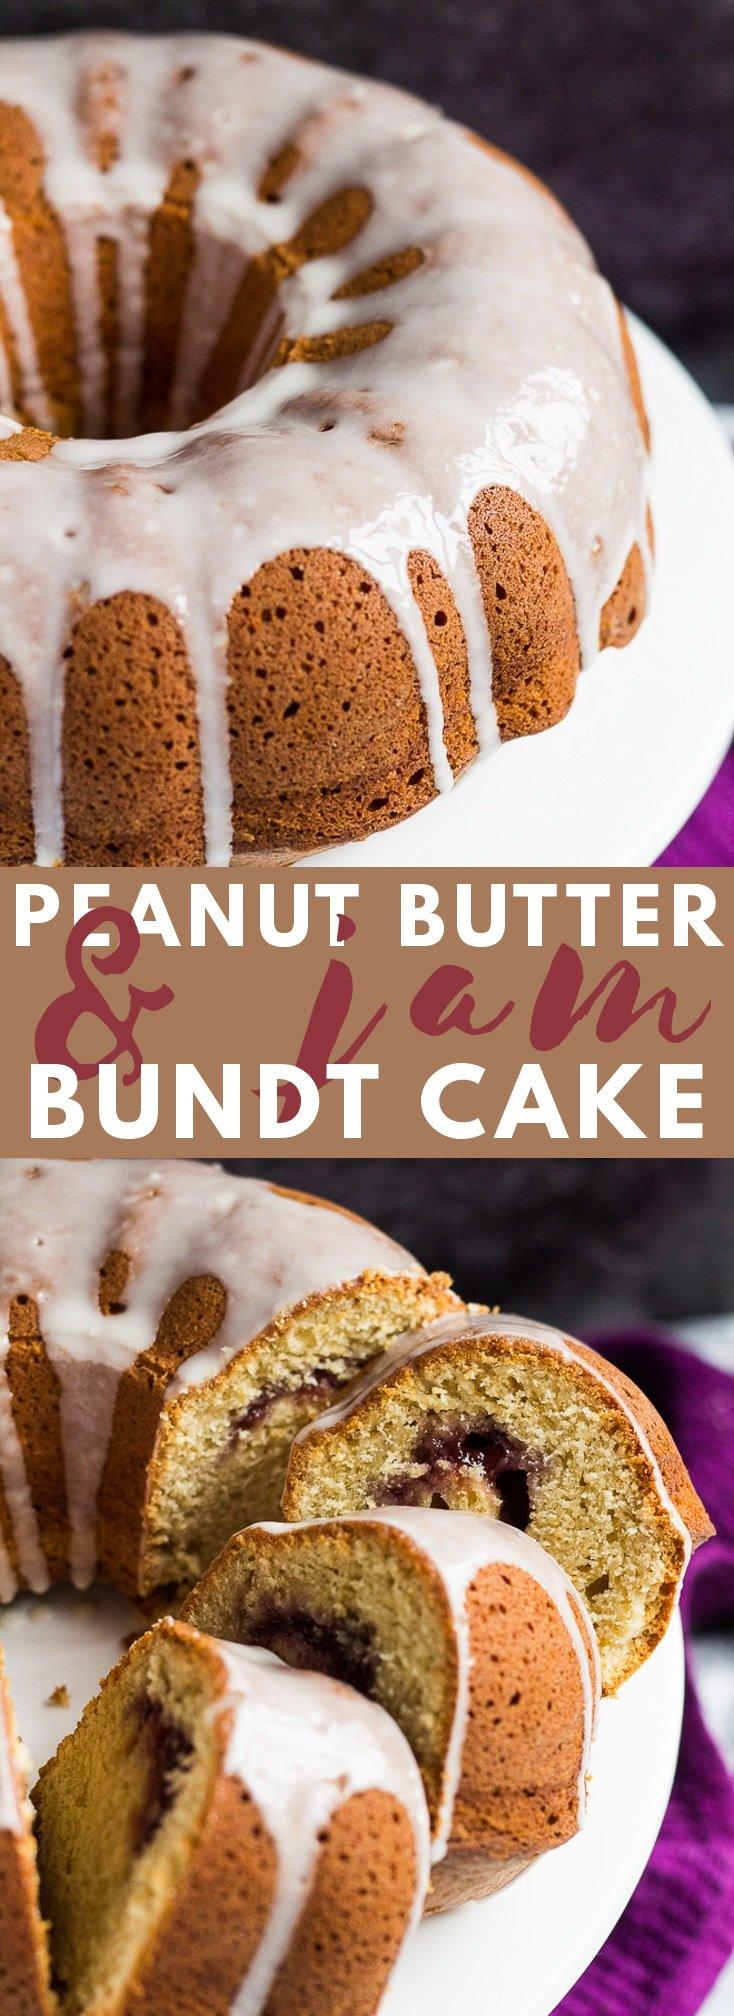 Peanut Butter and Jam Bundt Cake- A scrumptiously moist and fluffy peanut butter flavoured bundt cake swirled with a strawberry jam filling! #peanutbutter #jam #bundtcake #cakerecipes